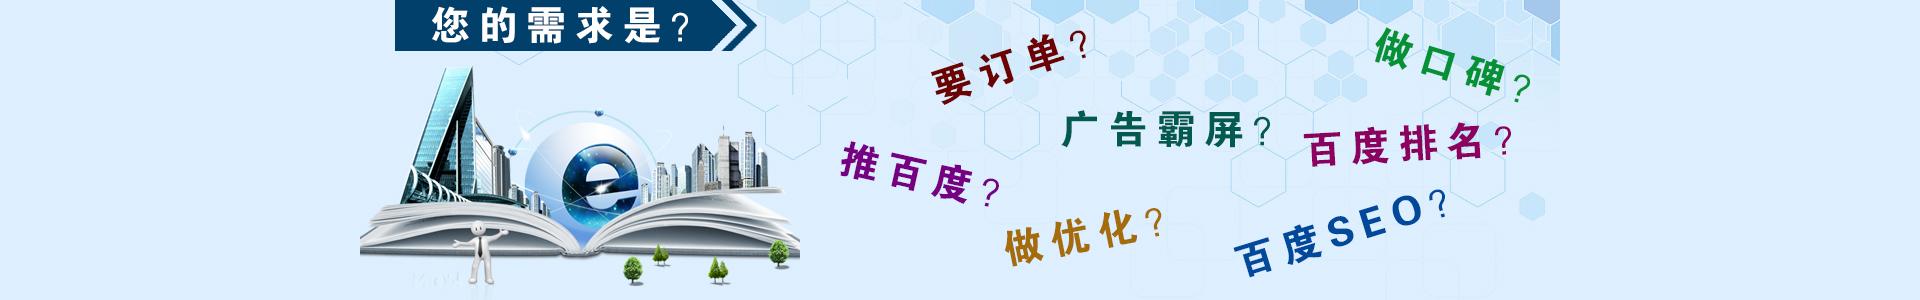 http://www.feizekeji.com/dianxin/170151.html